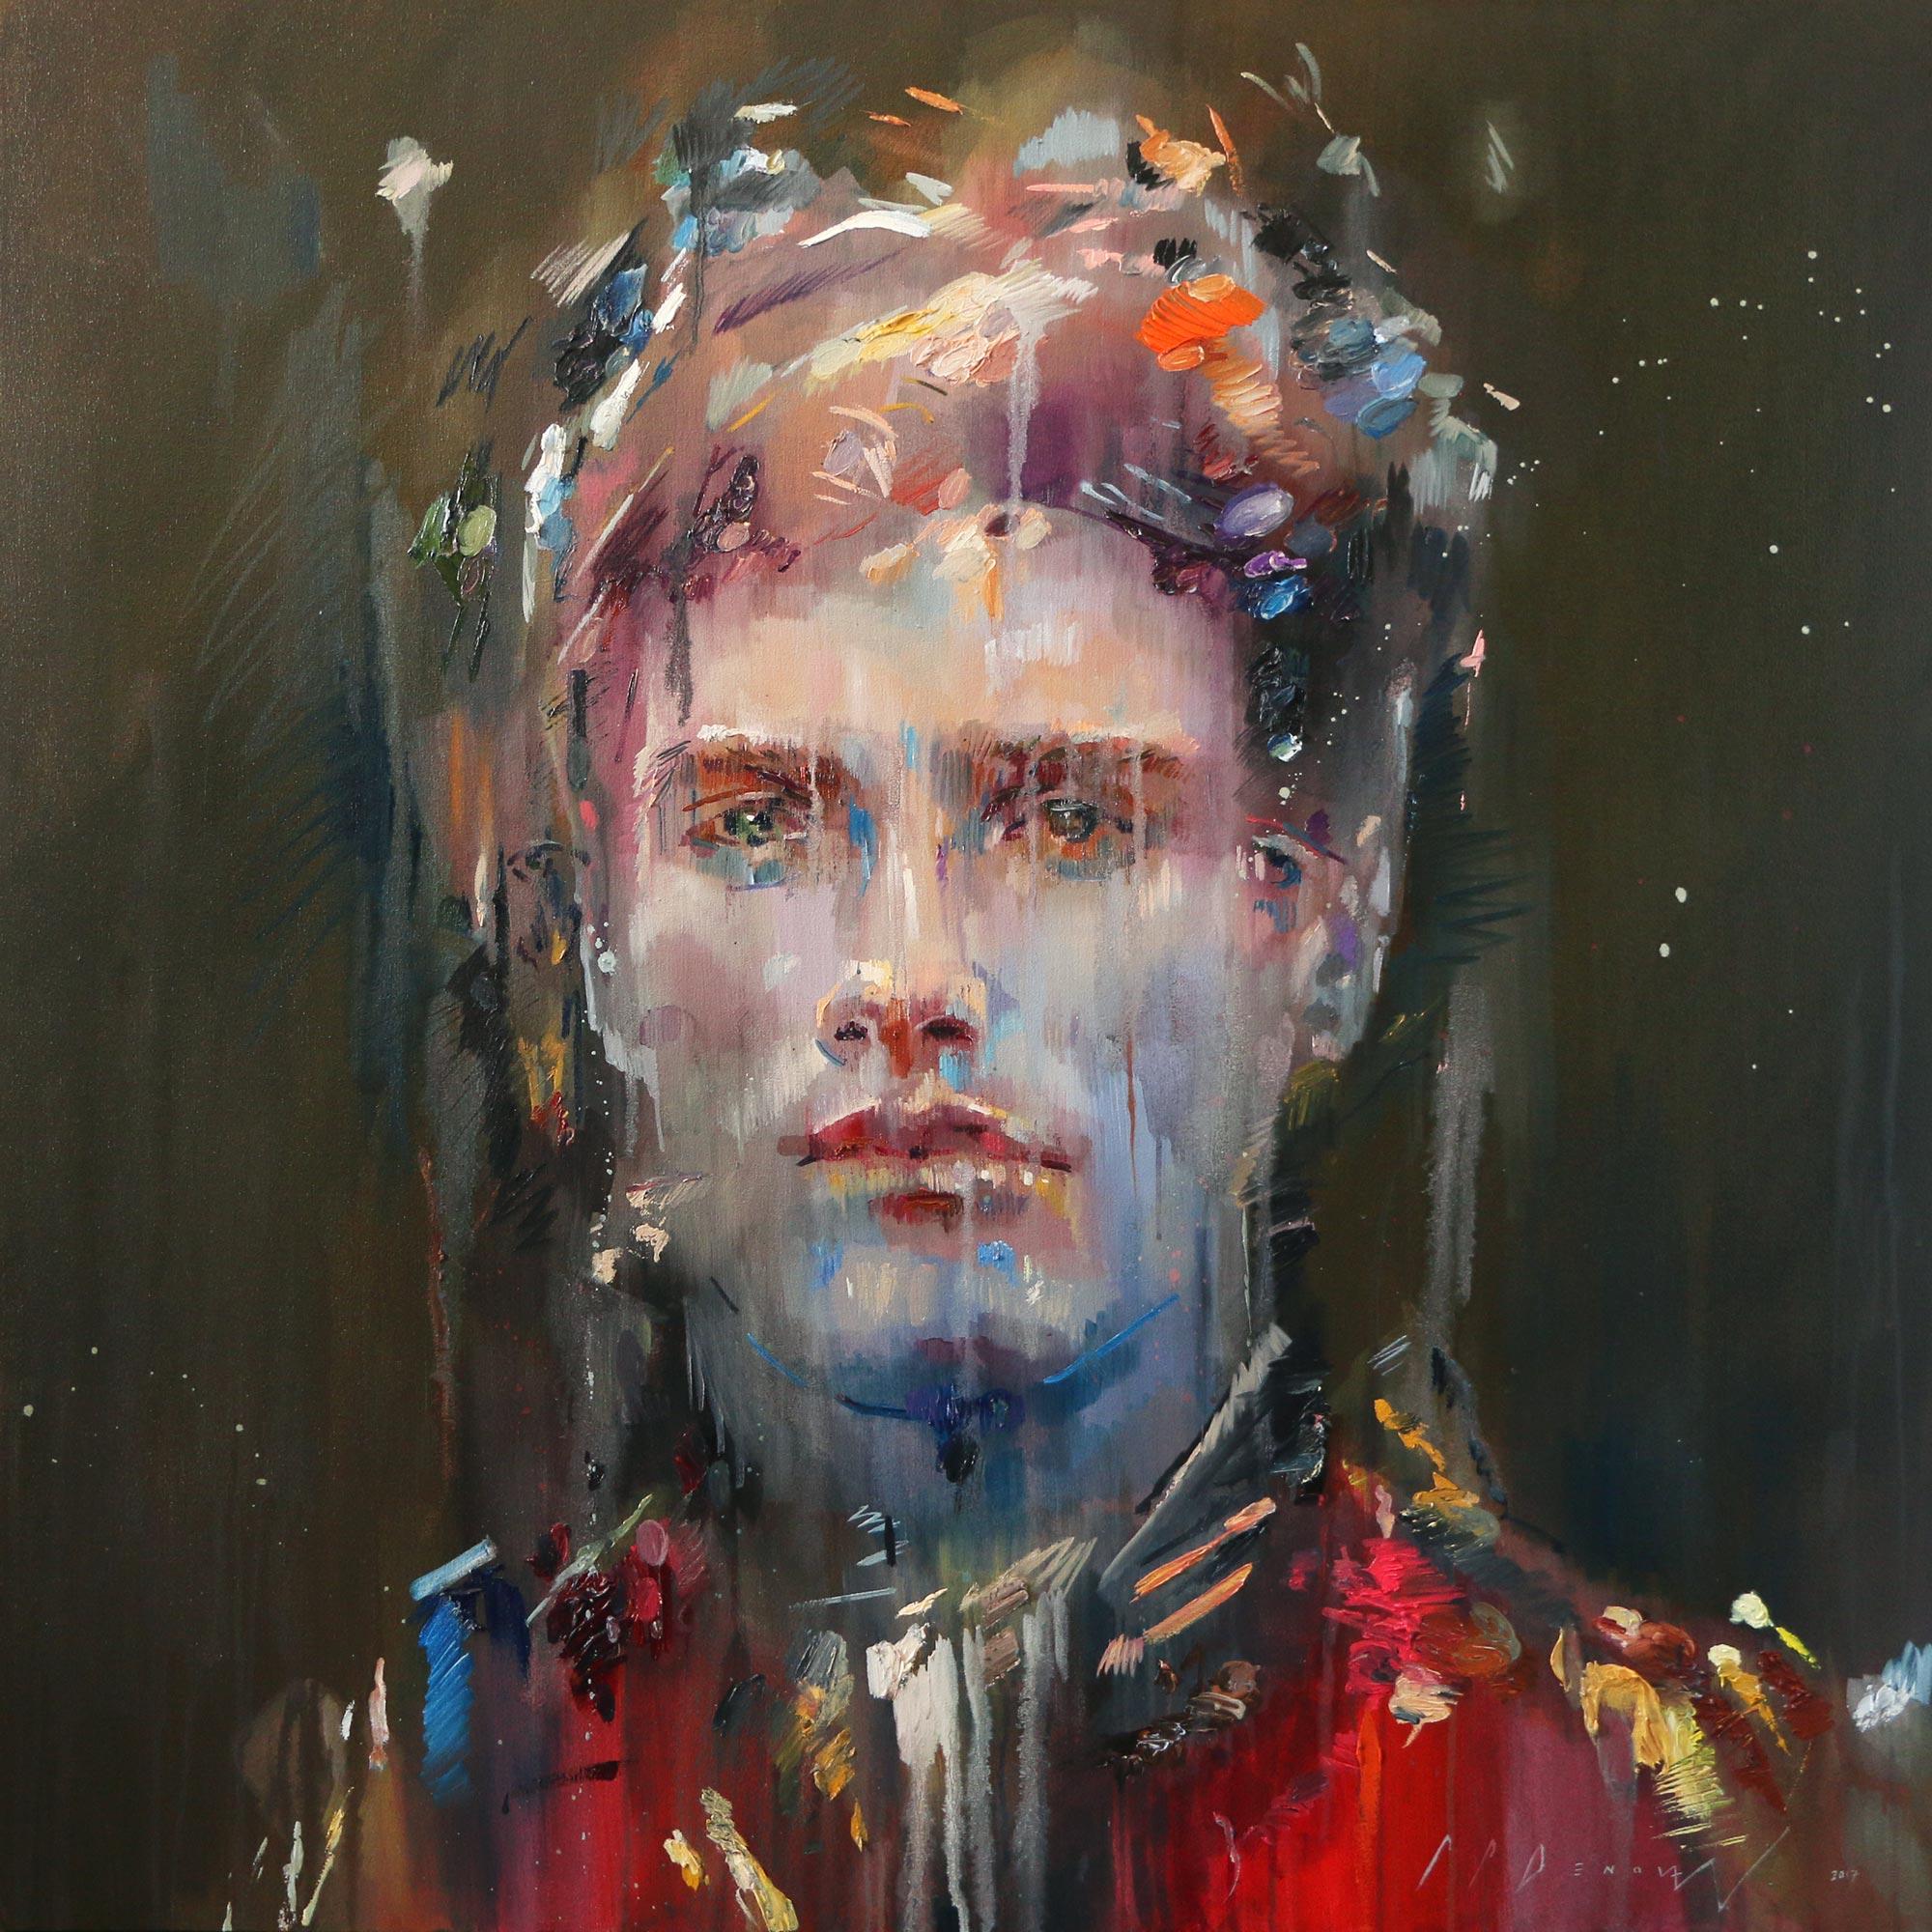 Apathetic Allegiance (Citlali-Nye). Oil on canvas.130cm x 130cm.